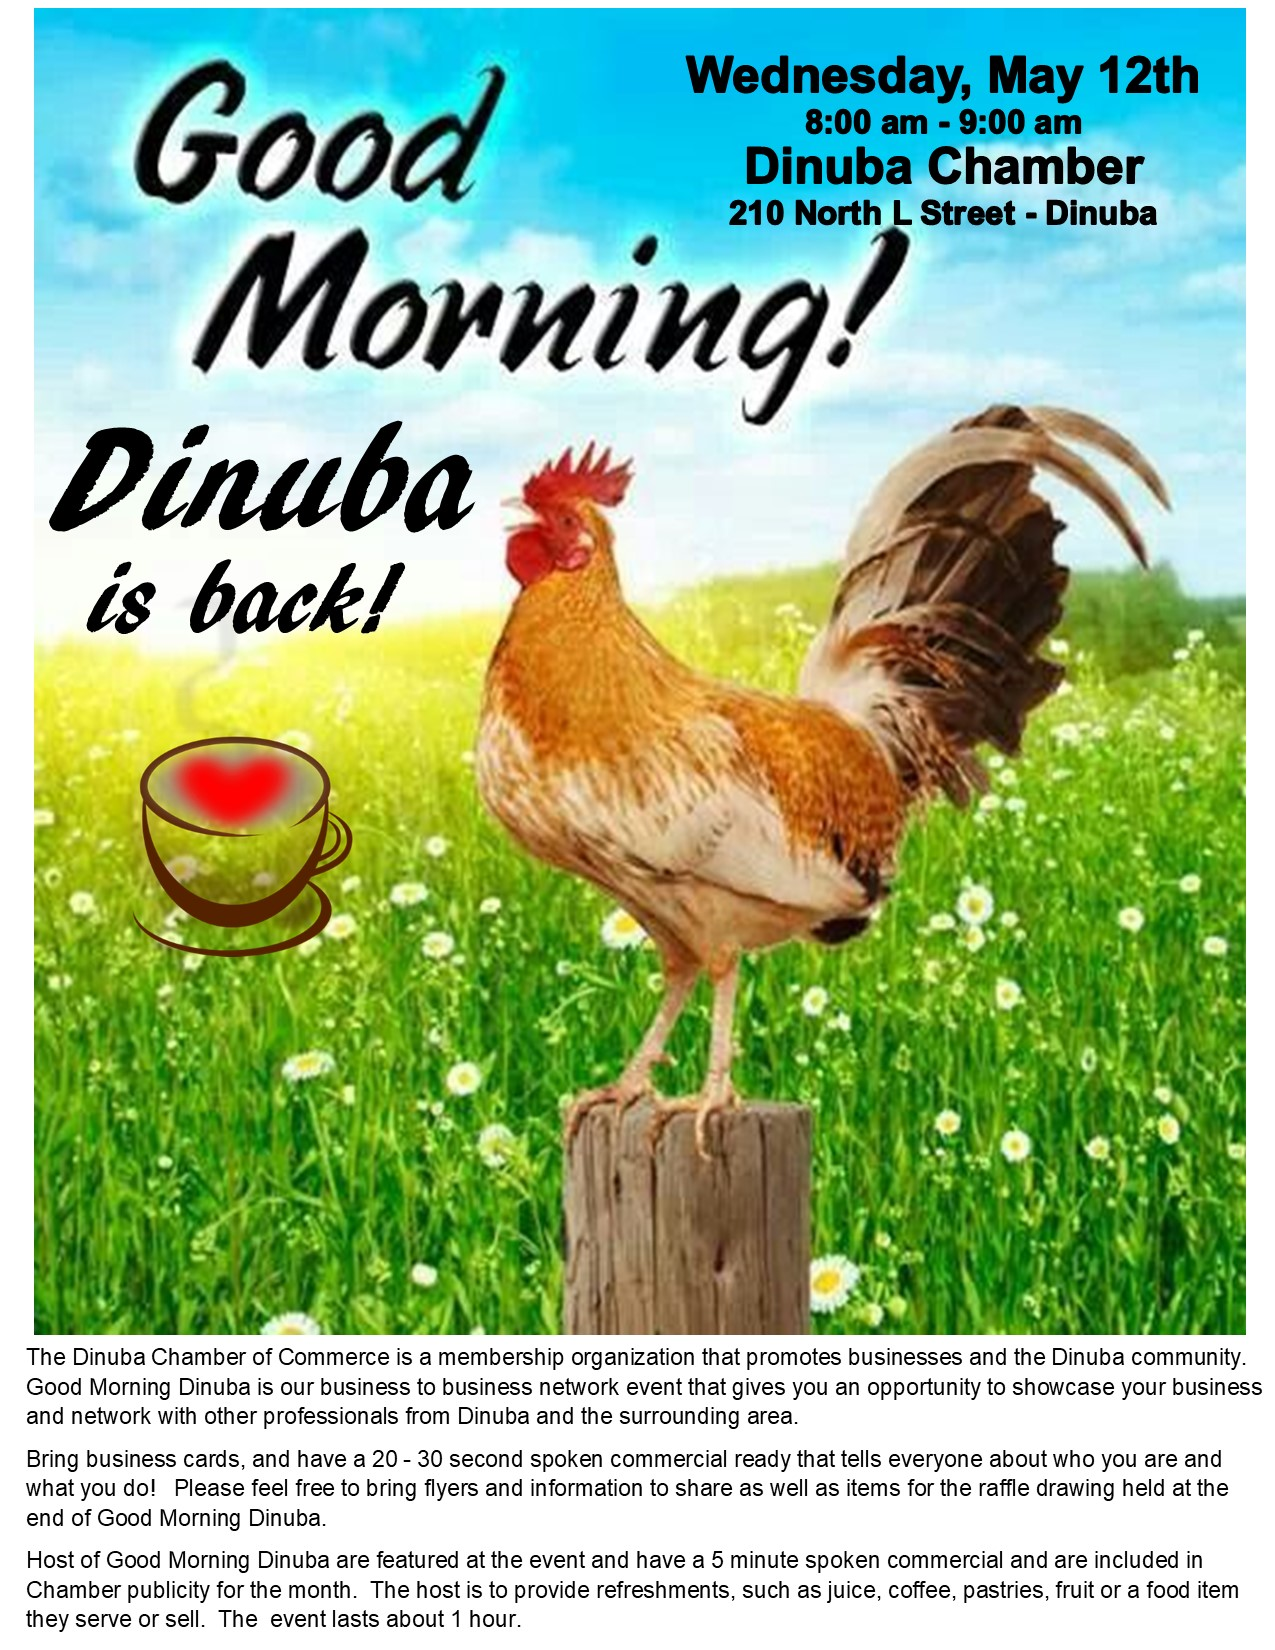 Good Morning Dinuba